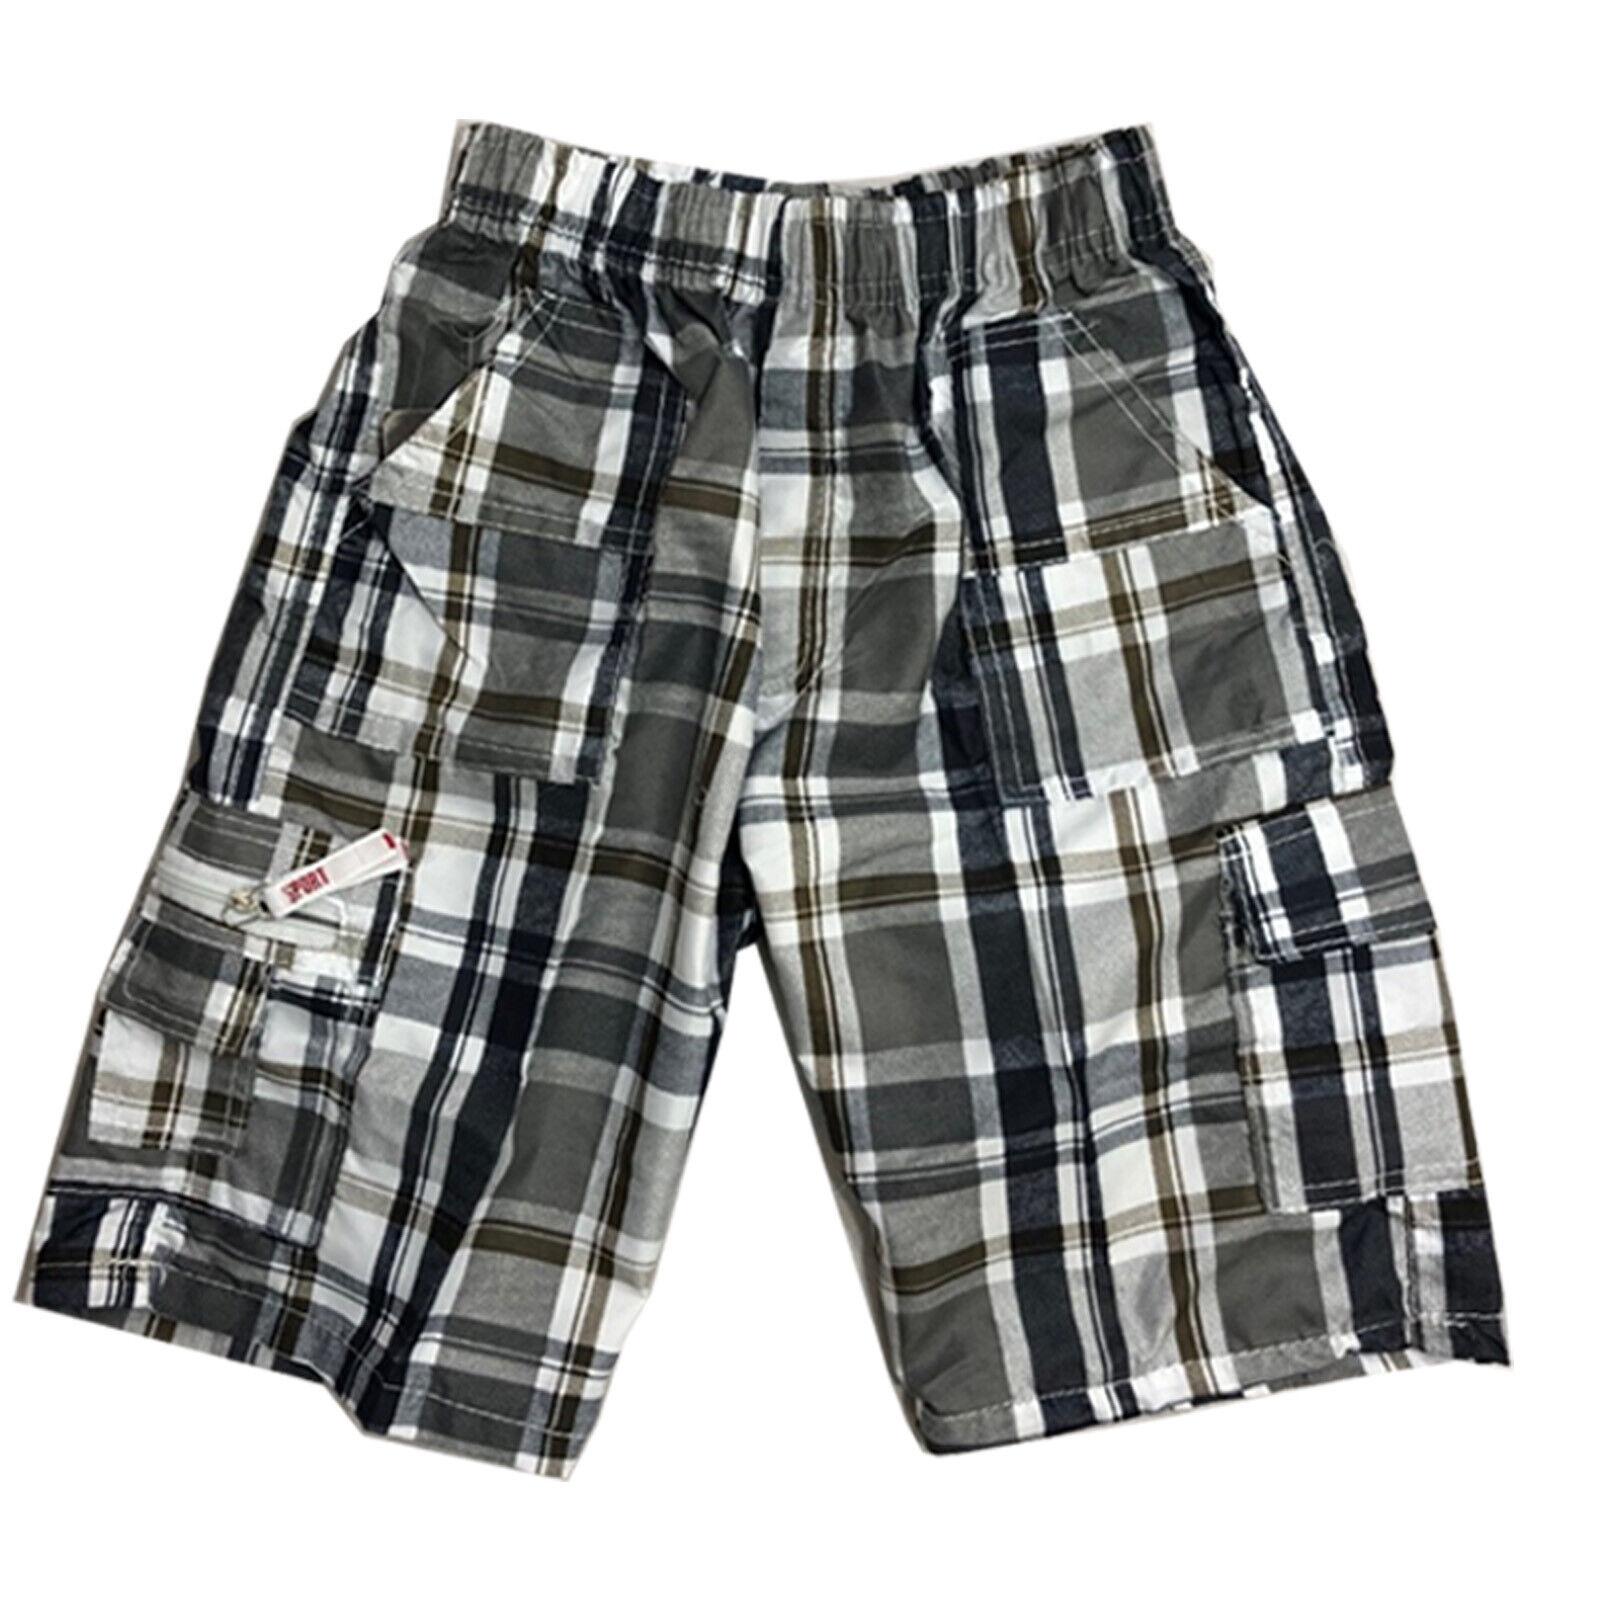 Boys Kids Shorts Check Combat Cargo Pocket Summer Fashion